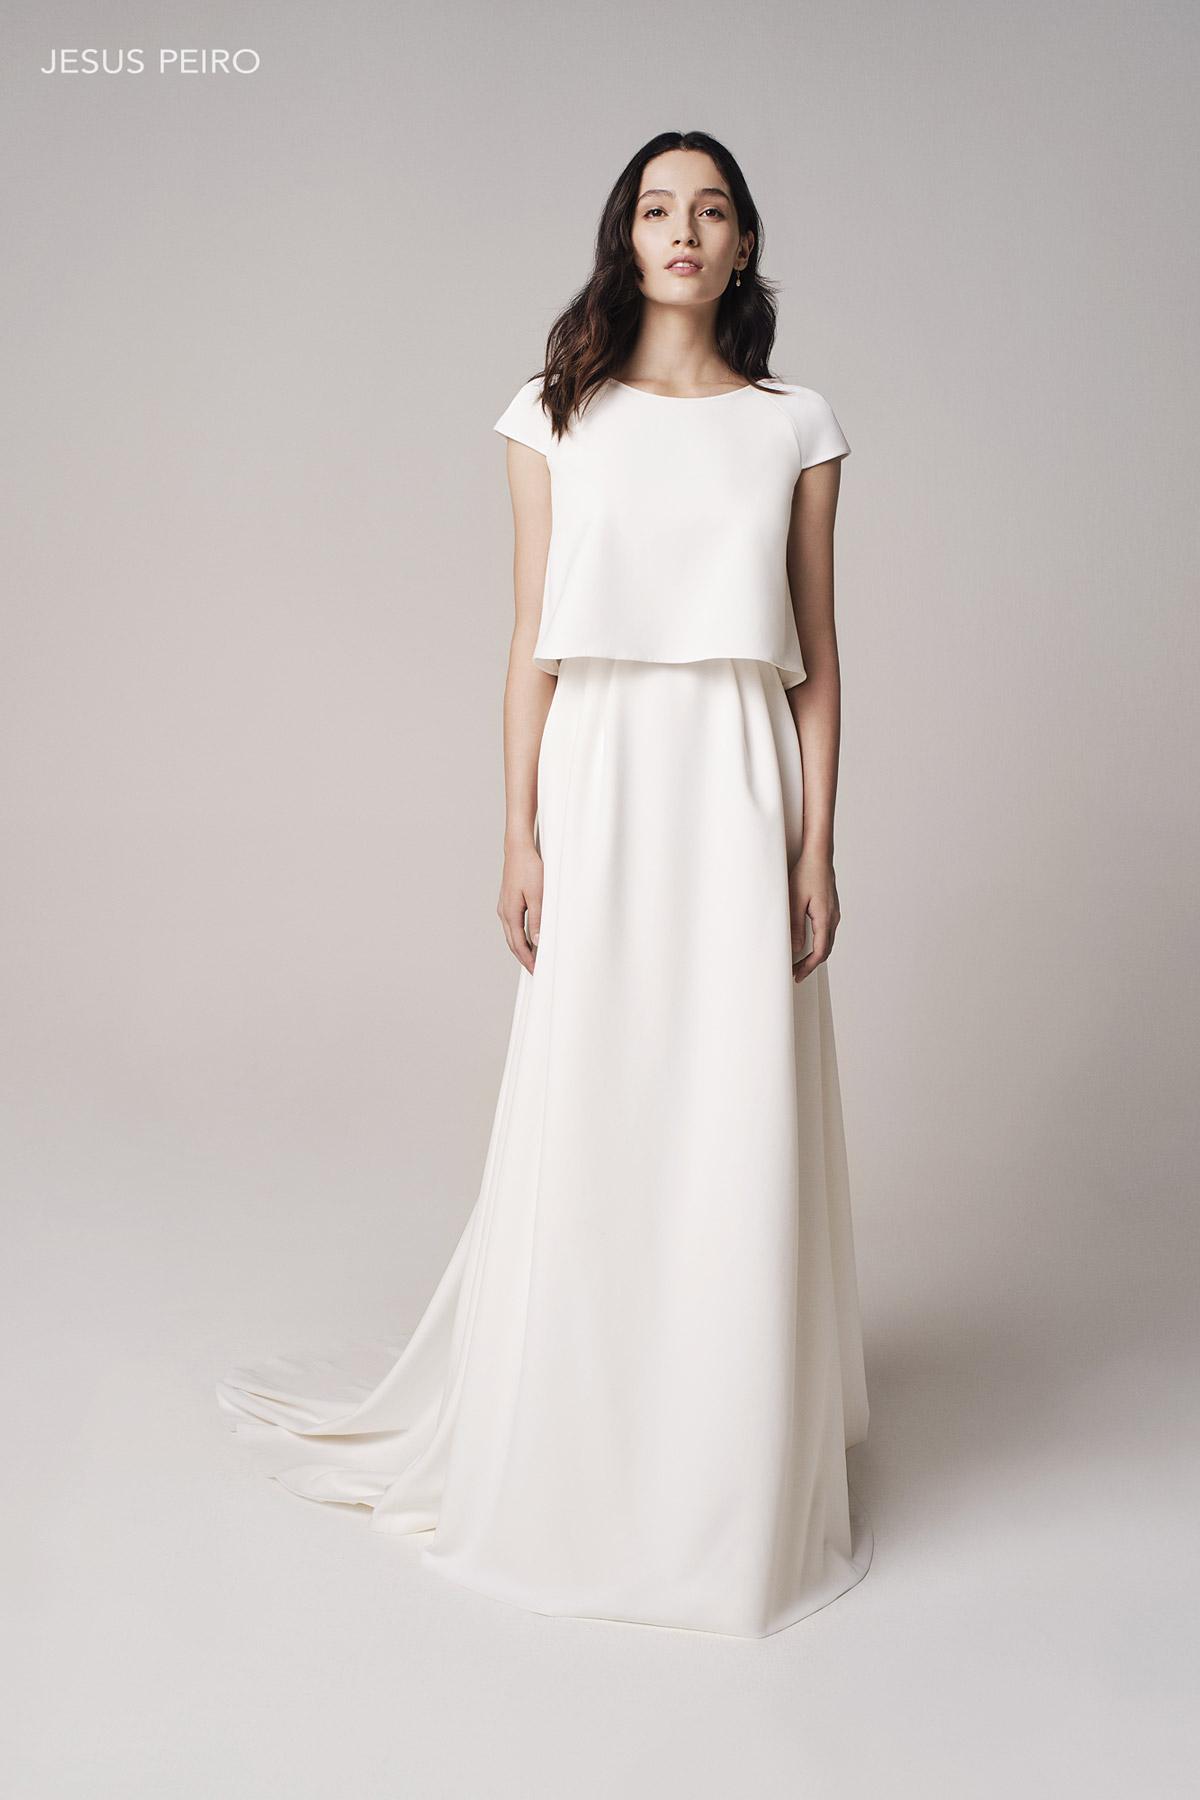 Vestido novia Jesús Peiró Ref.230